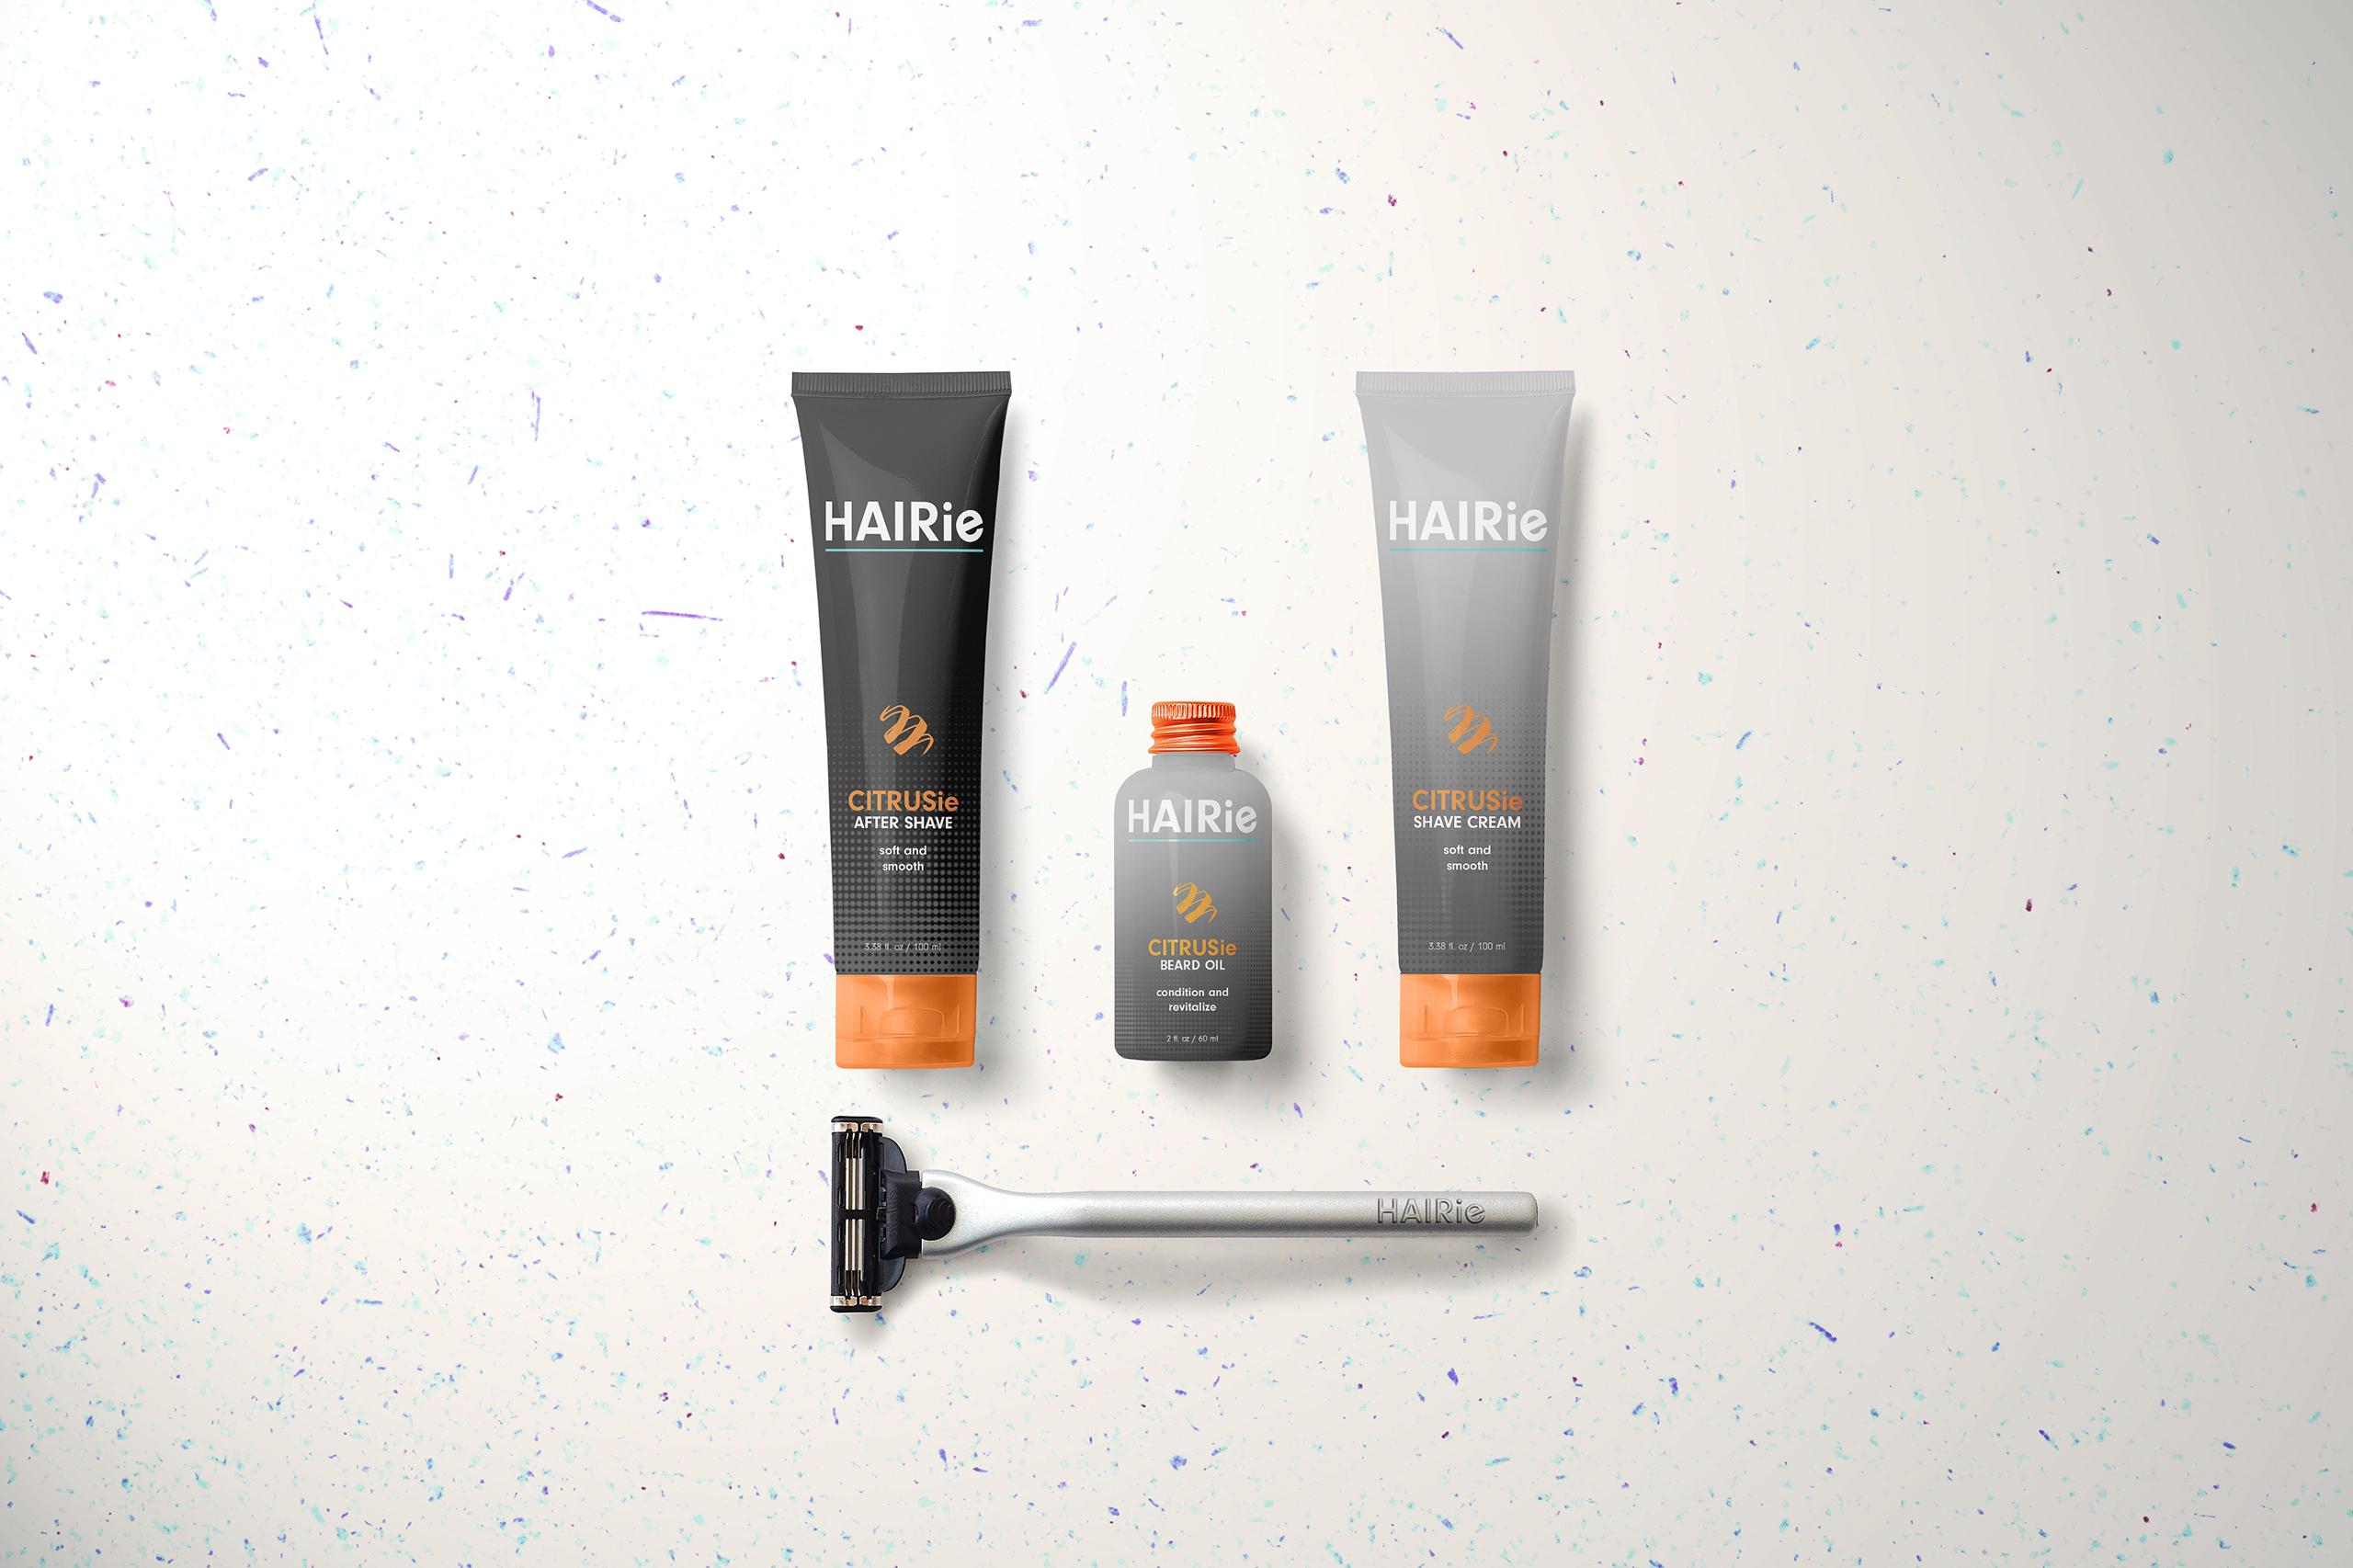 Hairie Citrusie shave kit